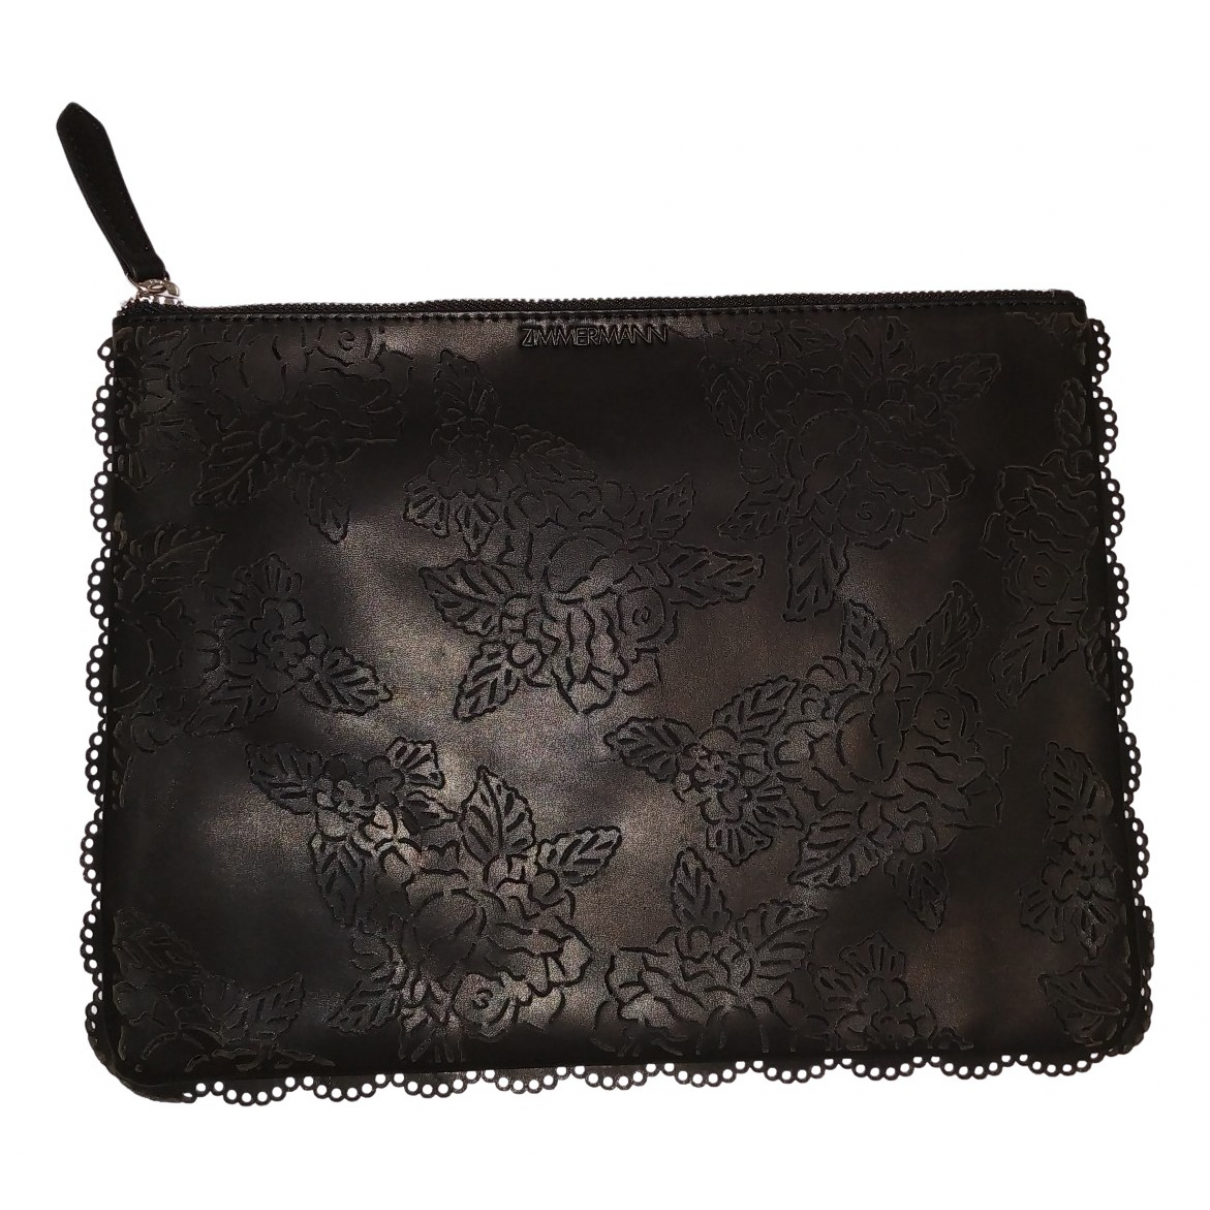 Zimmermann \N Black Leather Clutch bag for Women \N